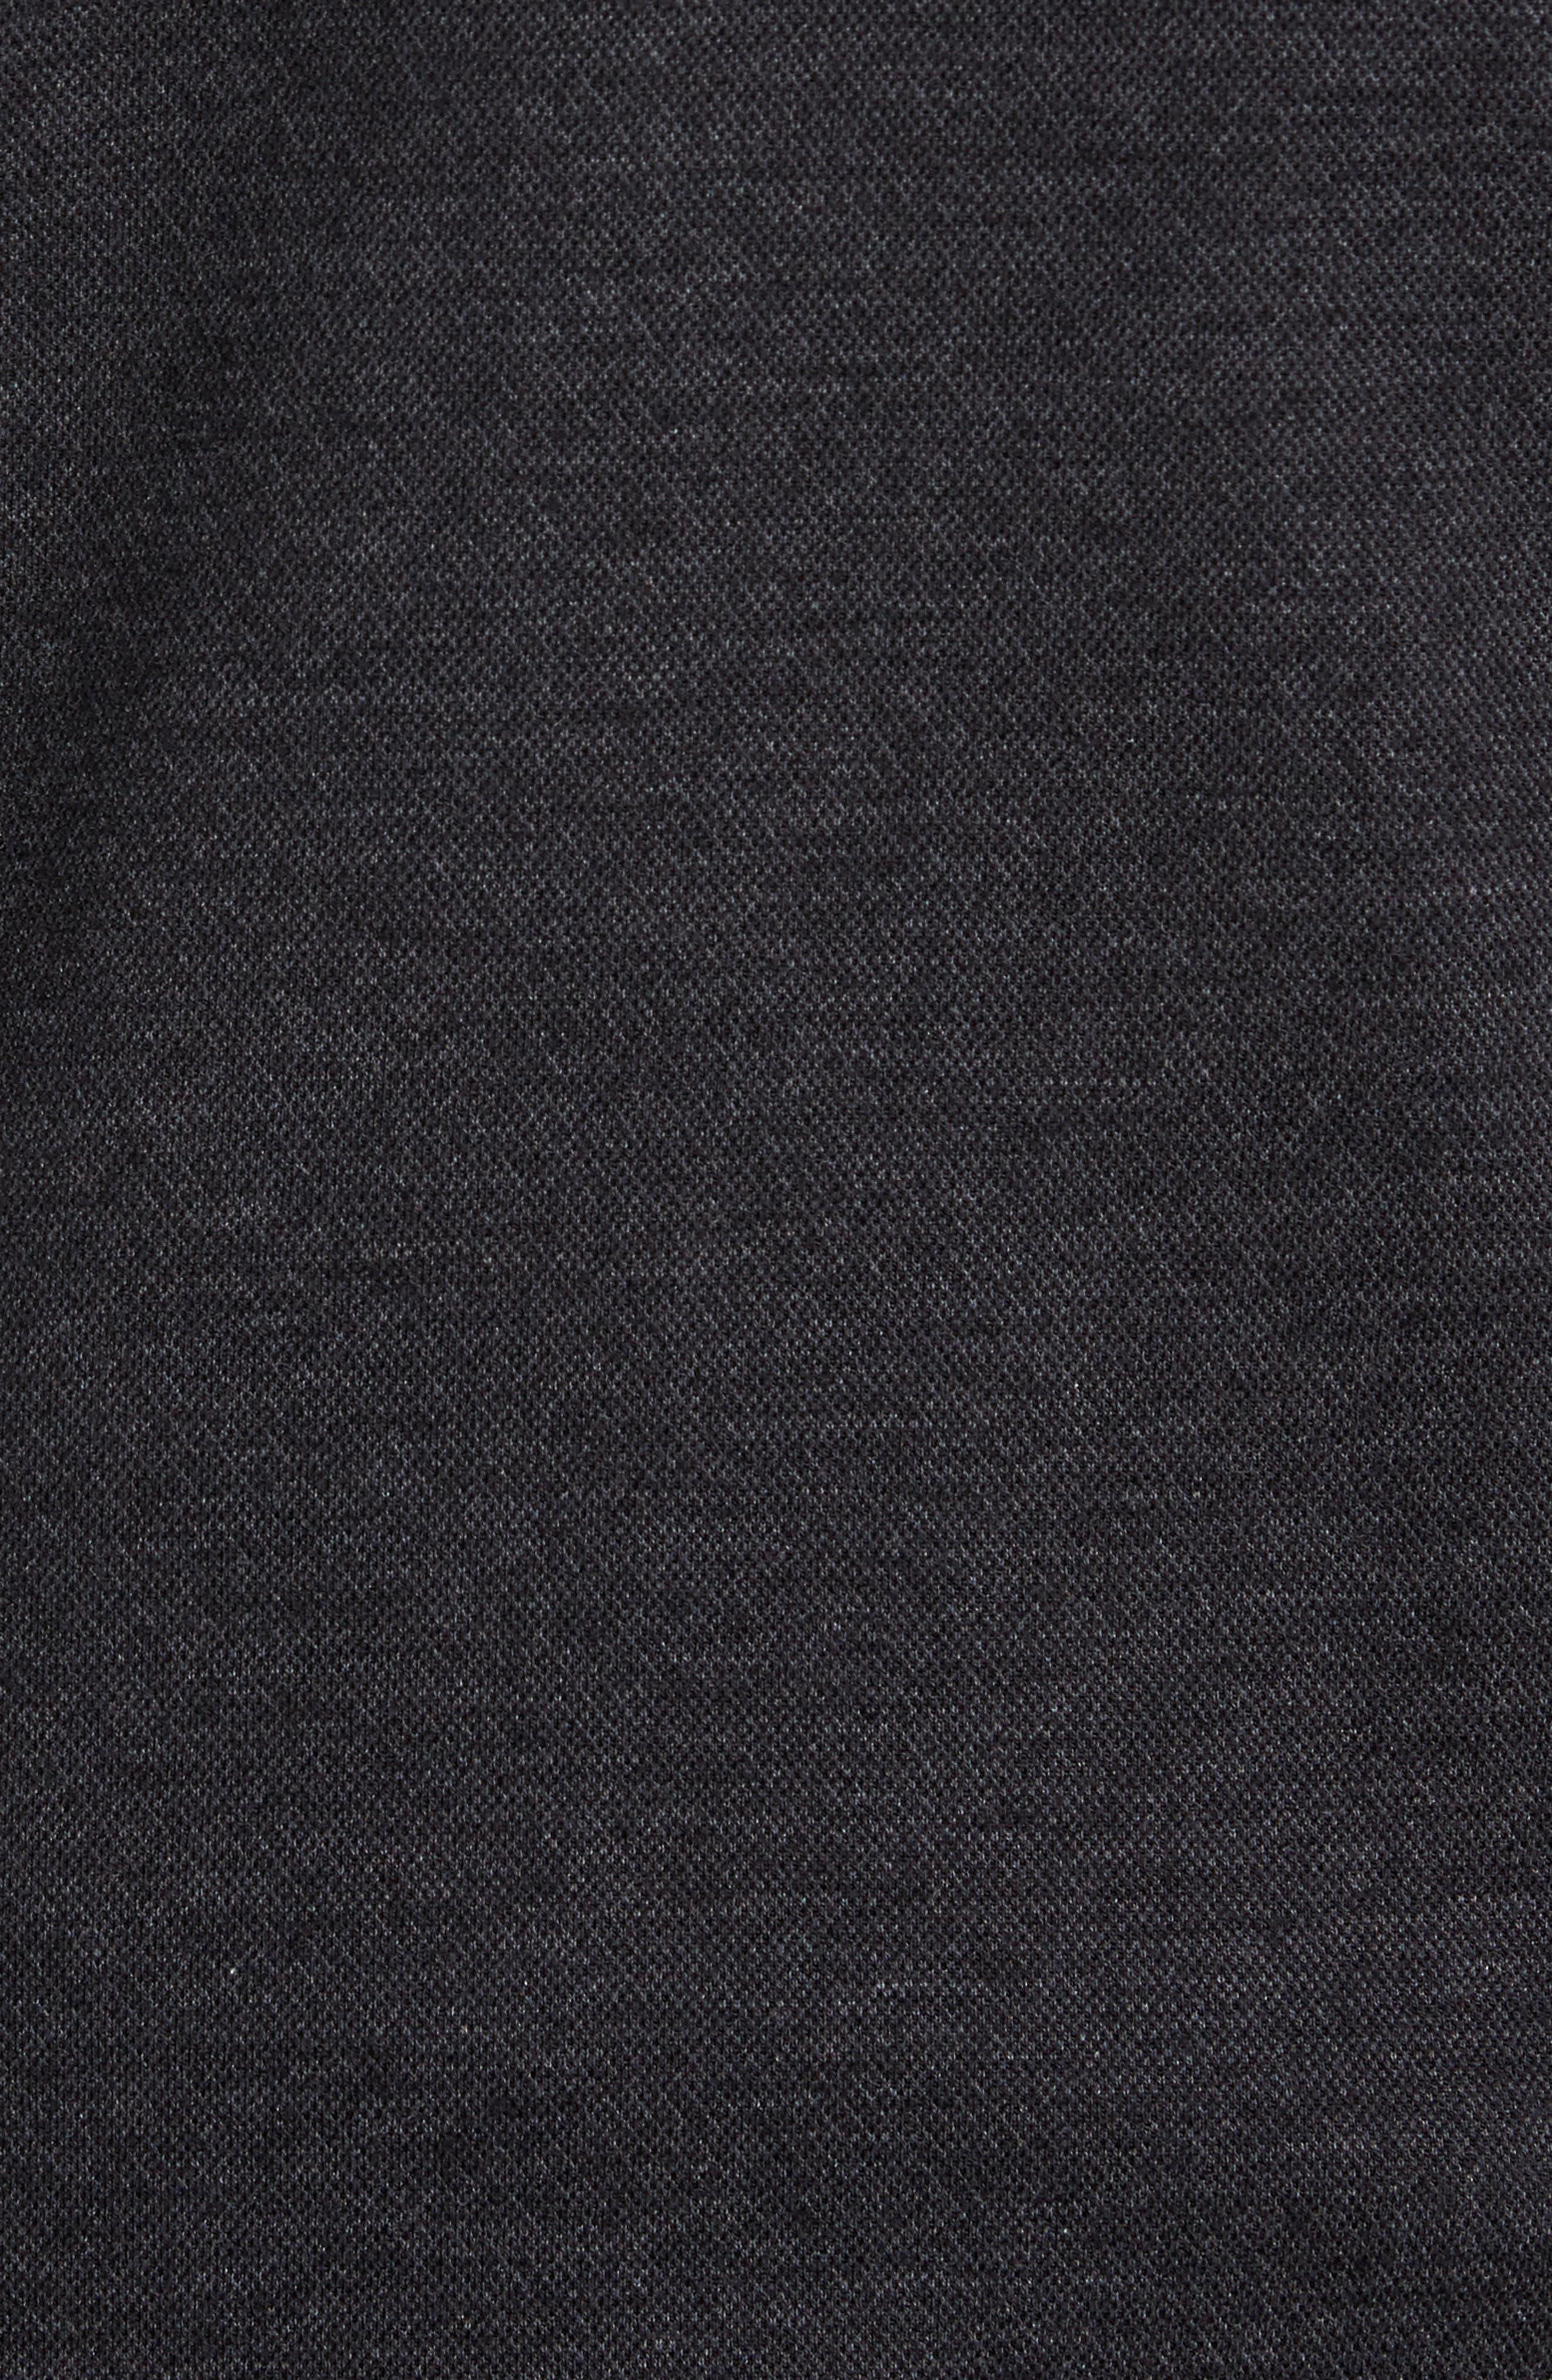 Salea Check Wool Blend Bomber Jacket,                             Alternate thumbnail 6, color,                             001